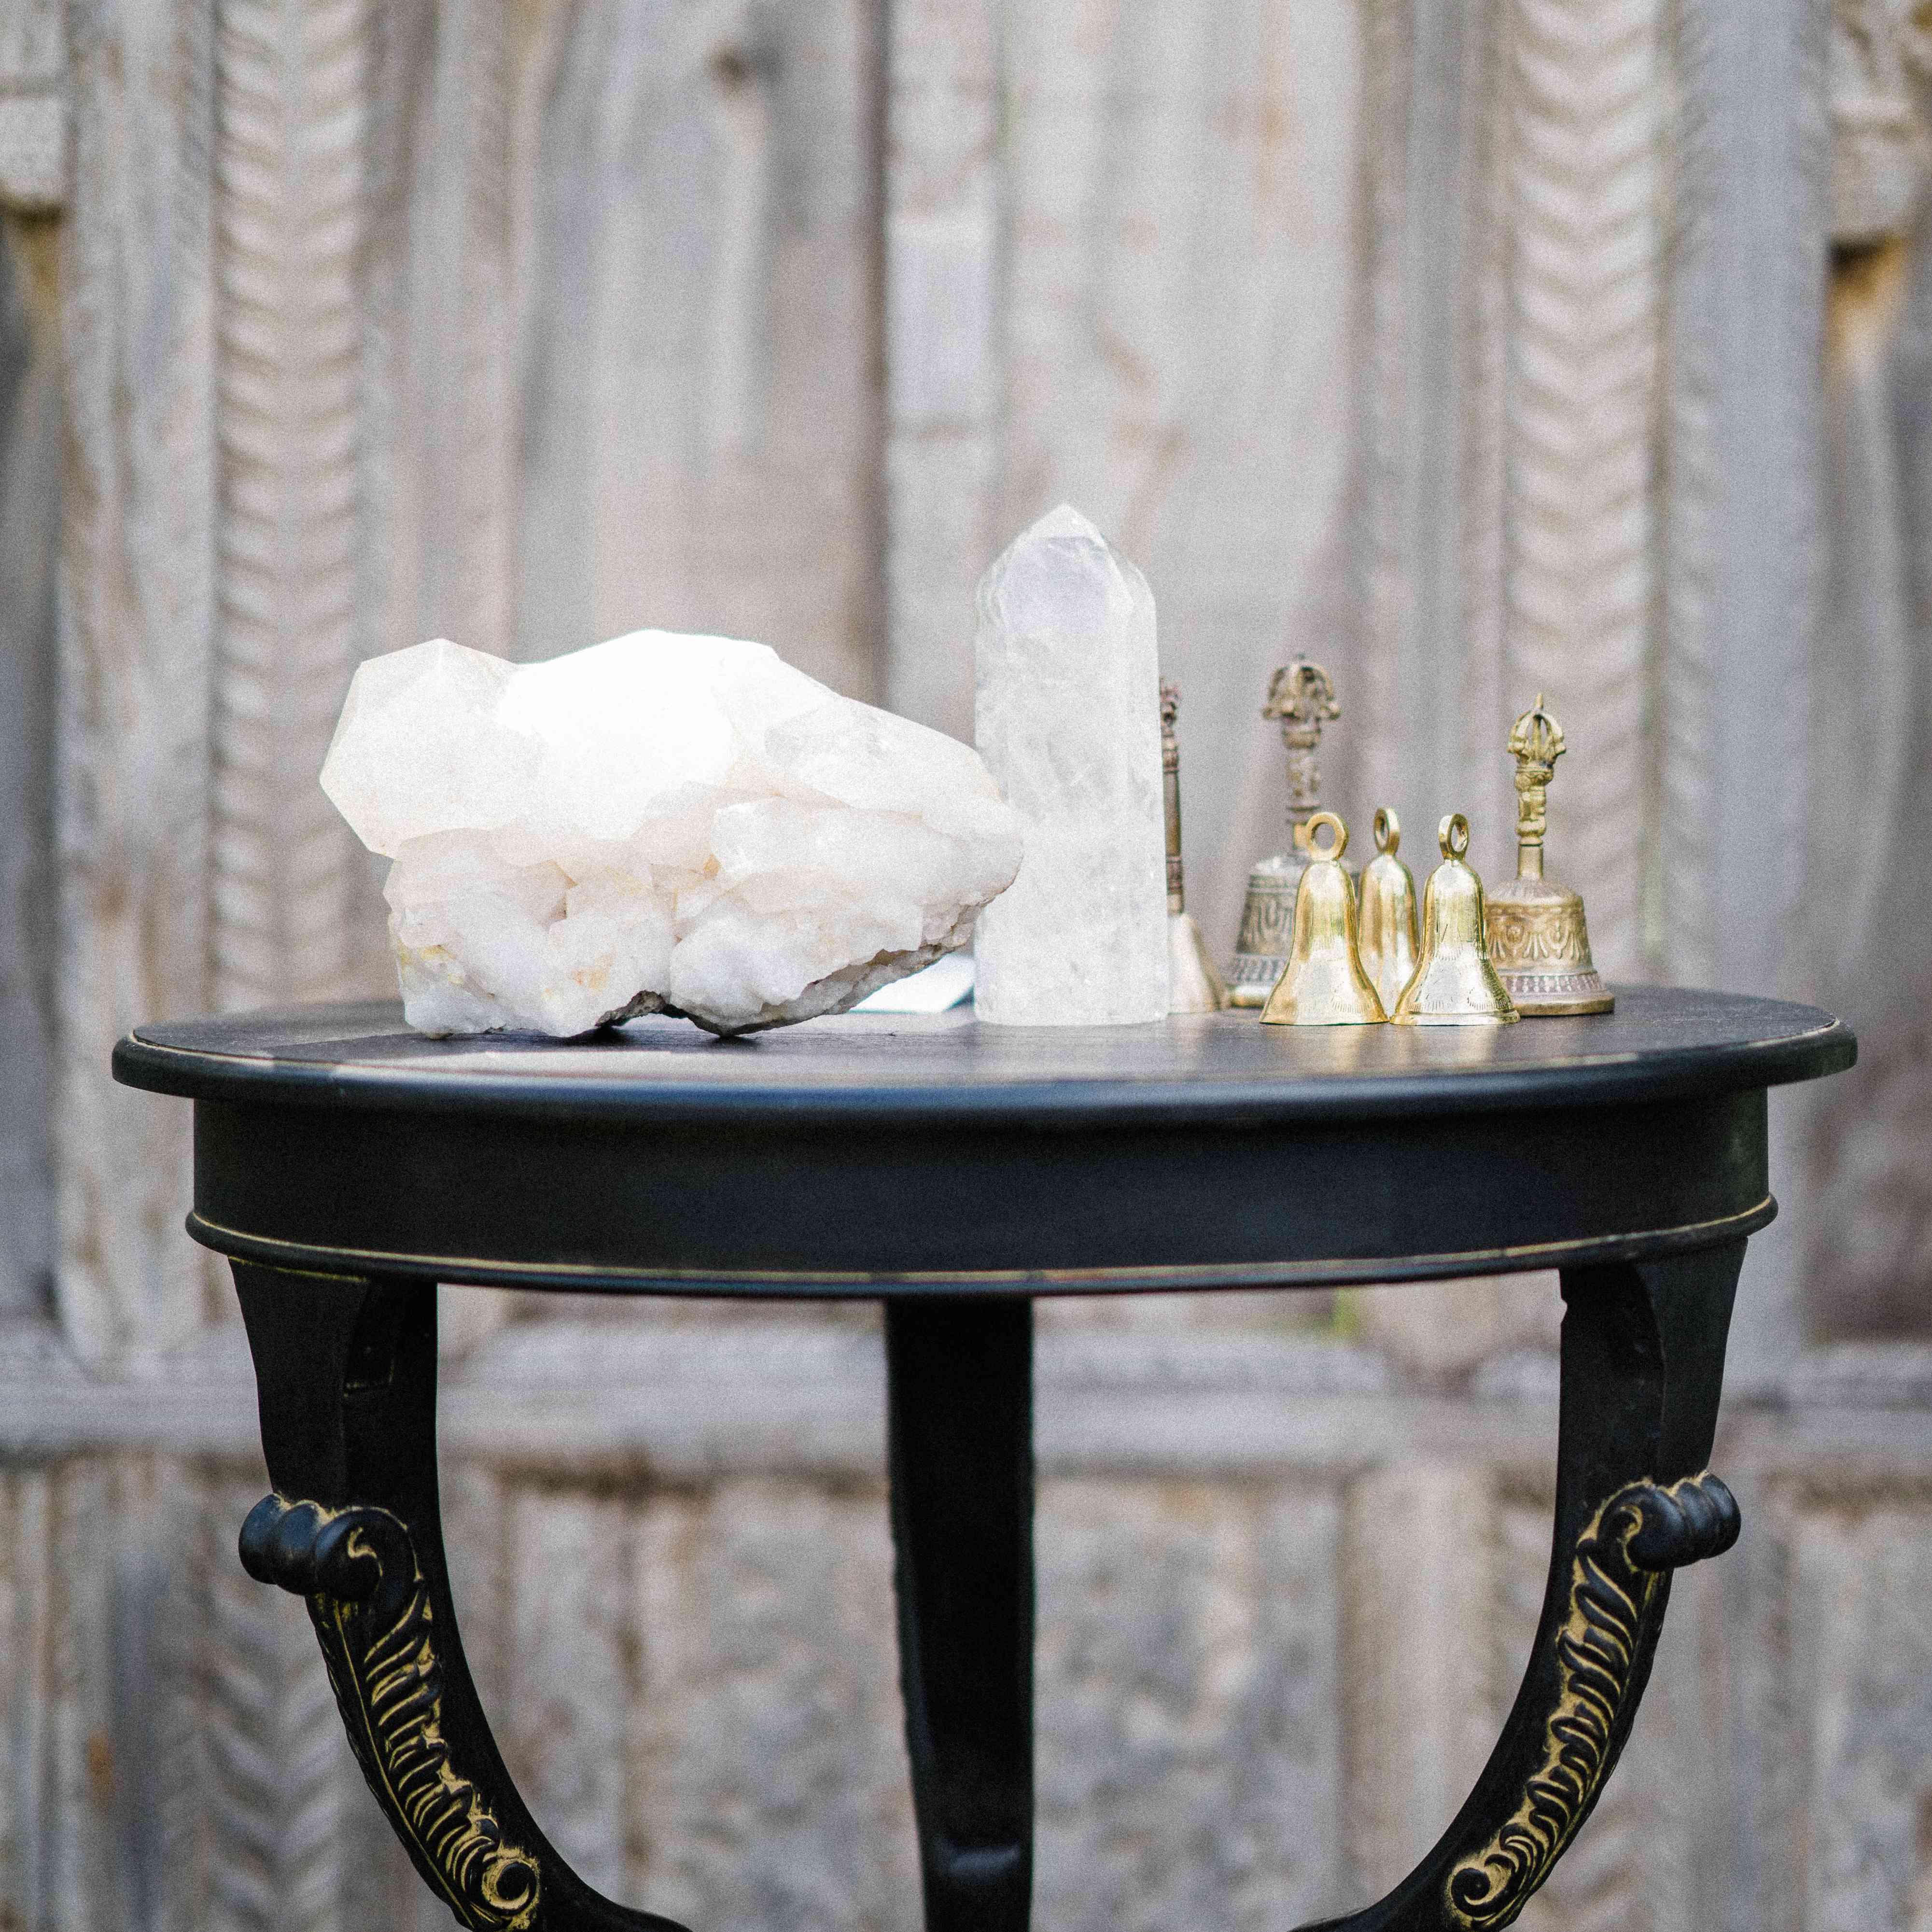 Bells and crystals